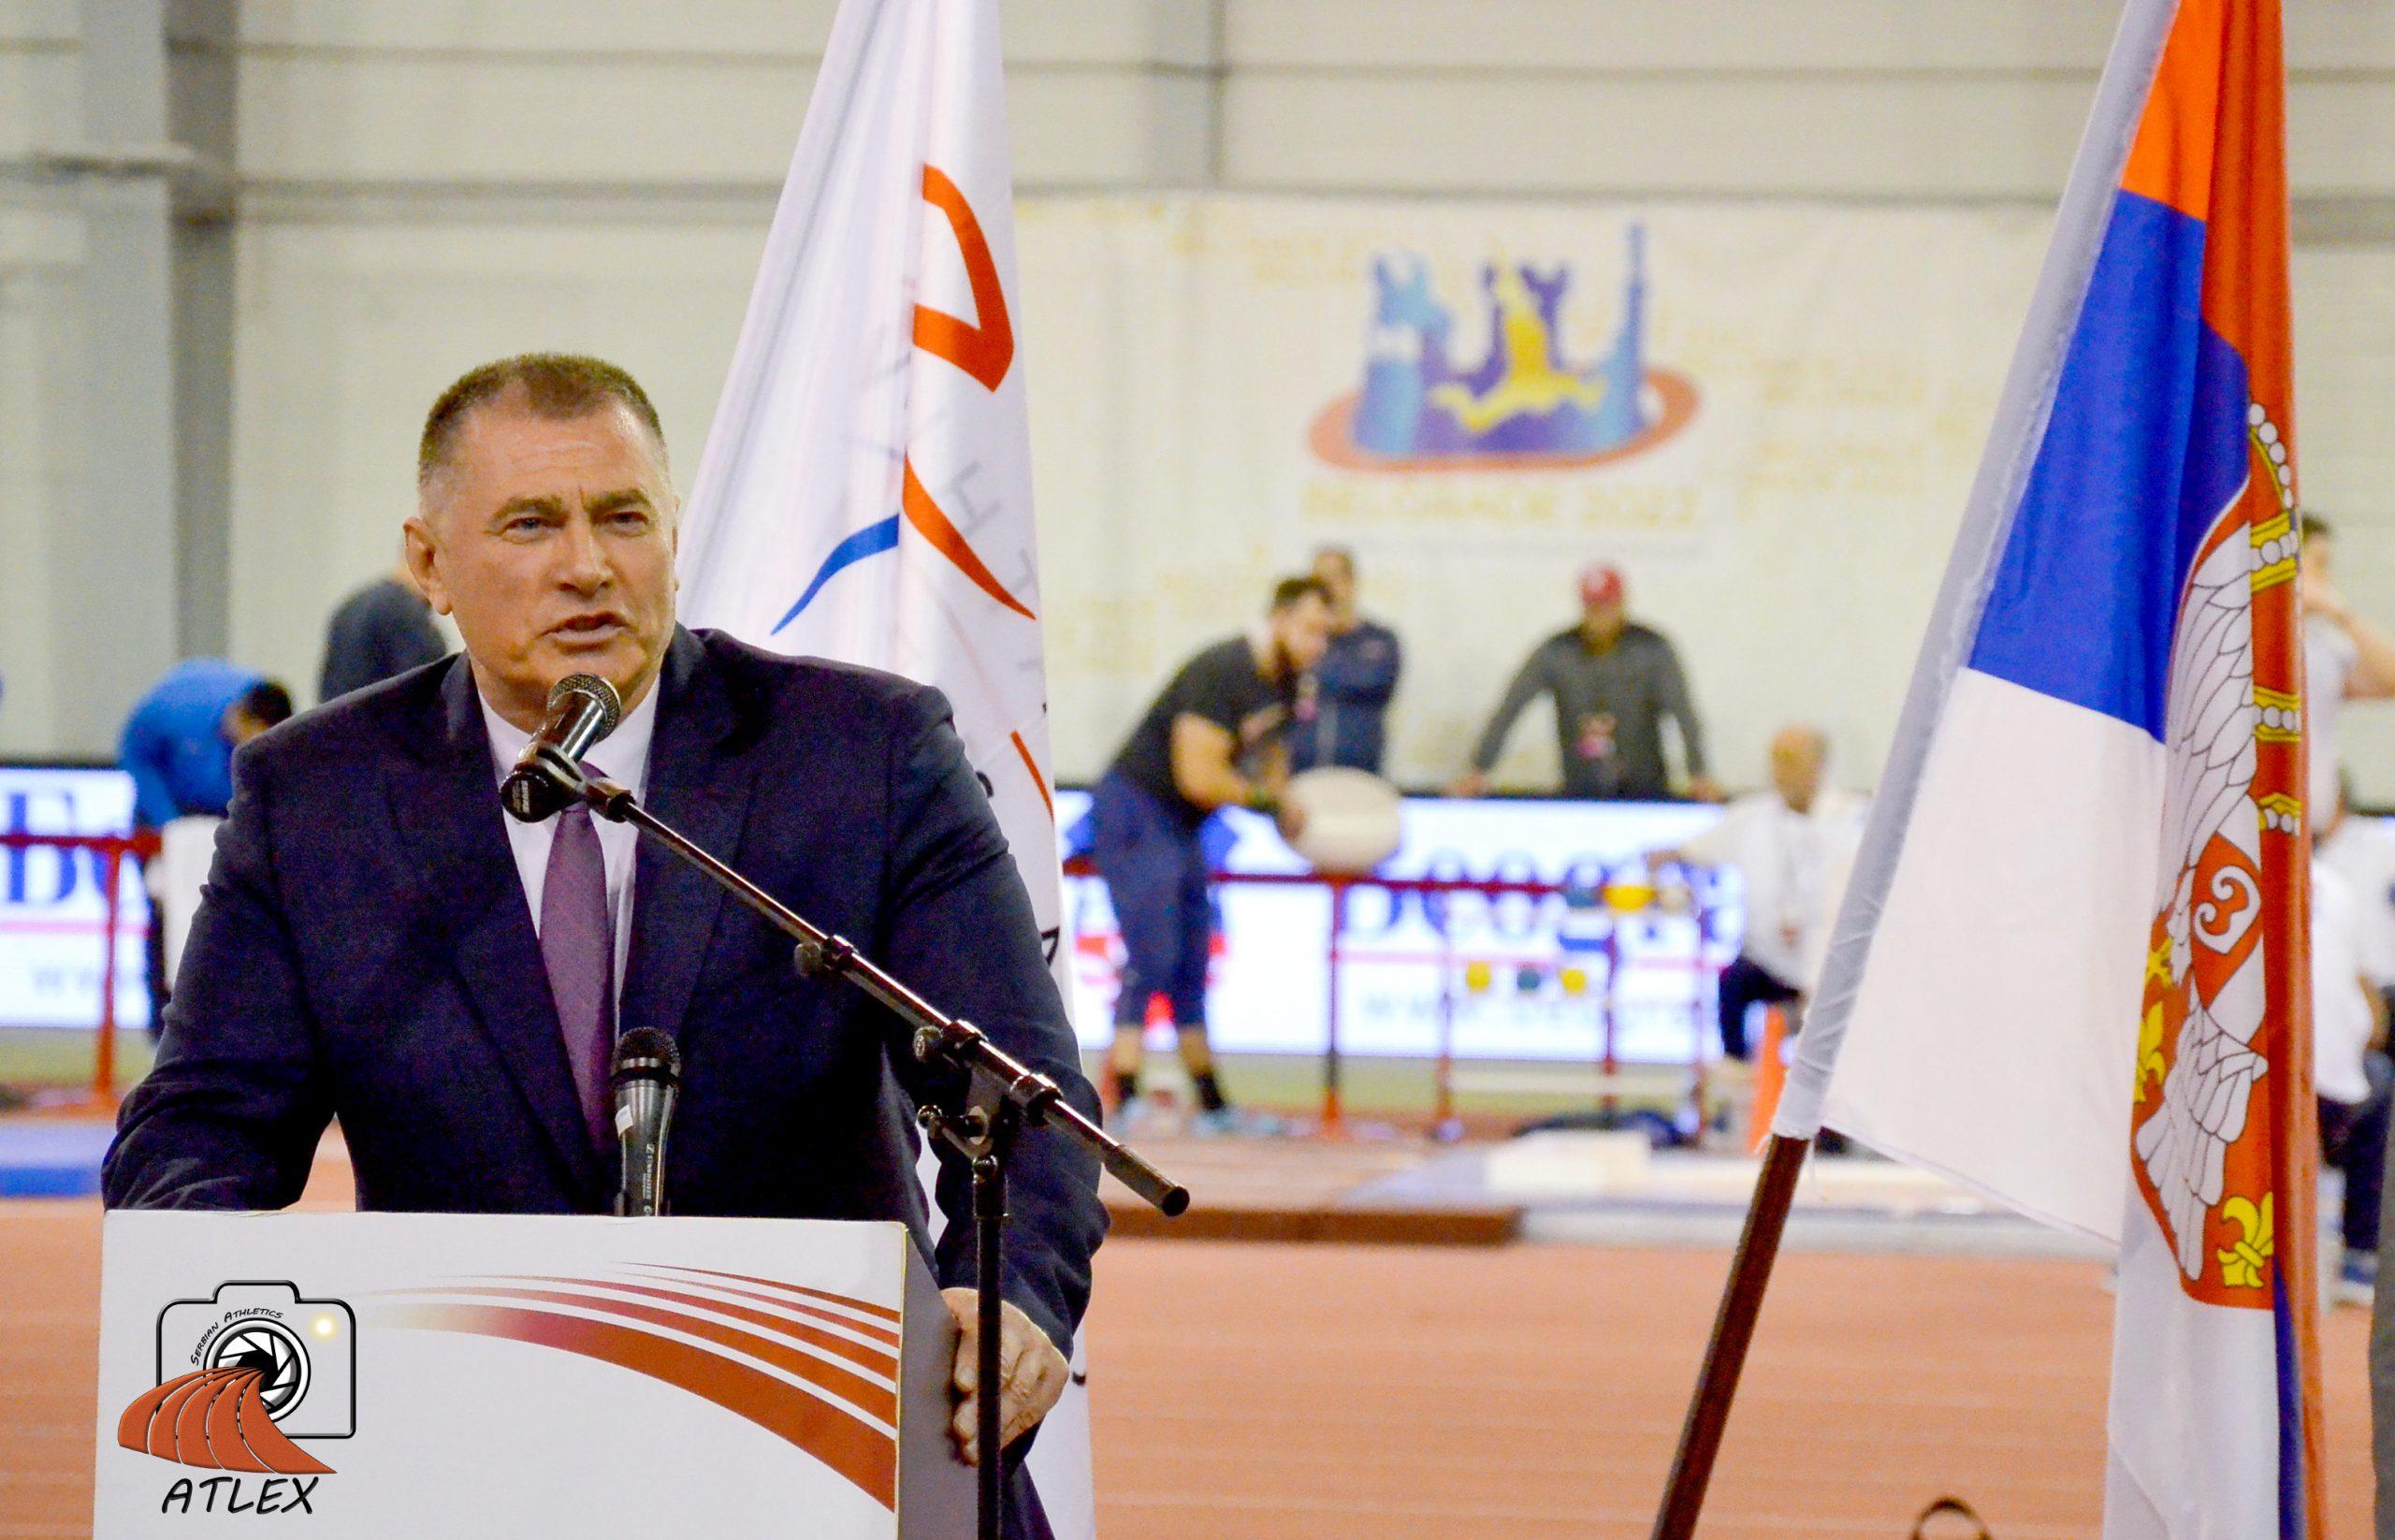 Dobromir Karamarinov, Serbian Open 2020